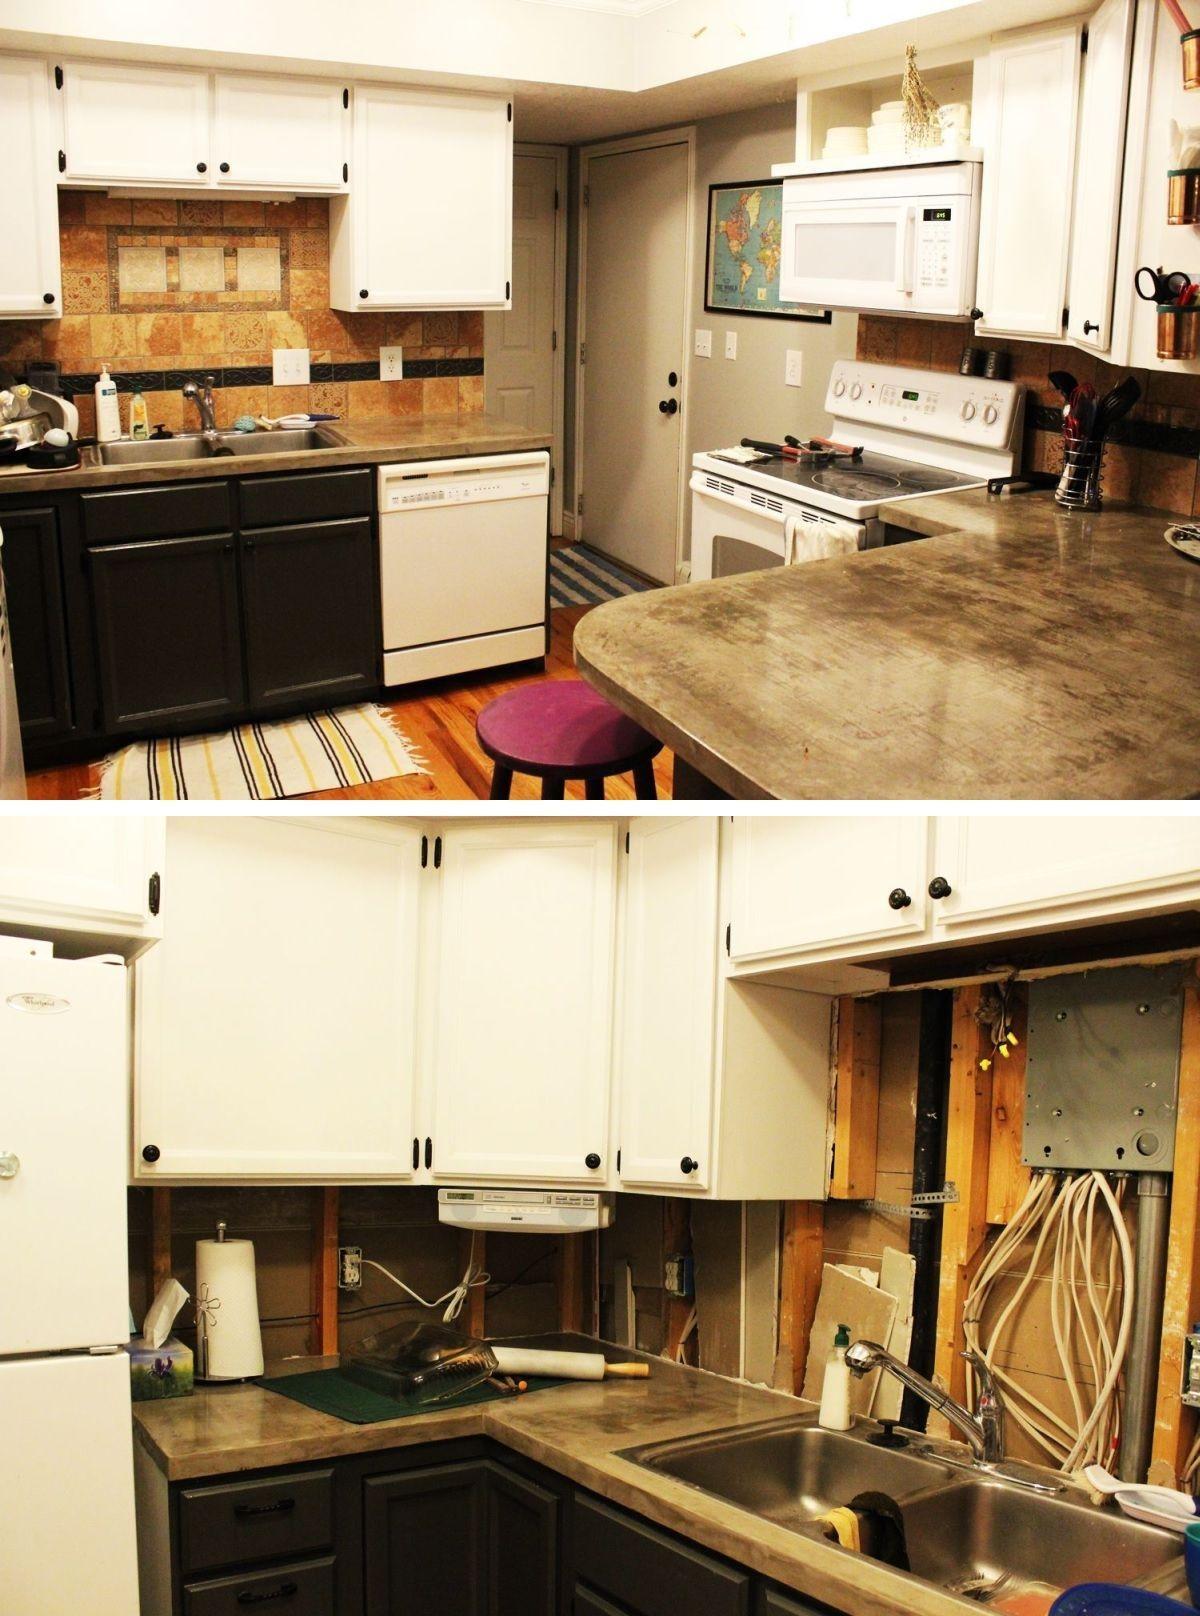 How to remove kitchen tile backsplash kitchen backsplash